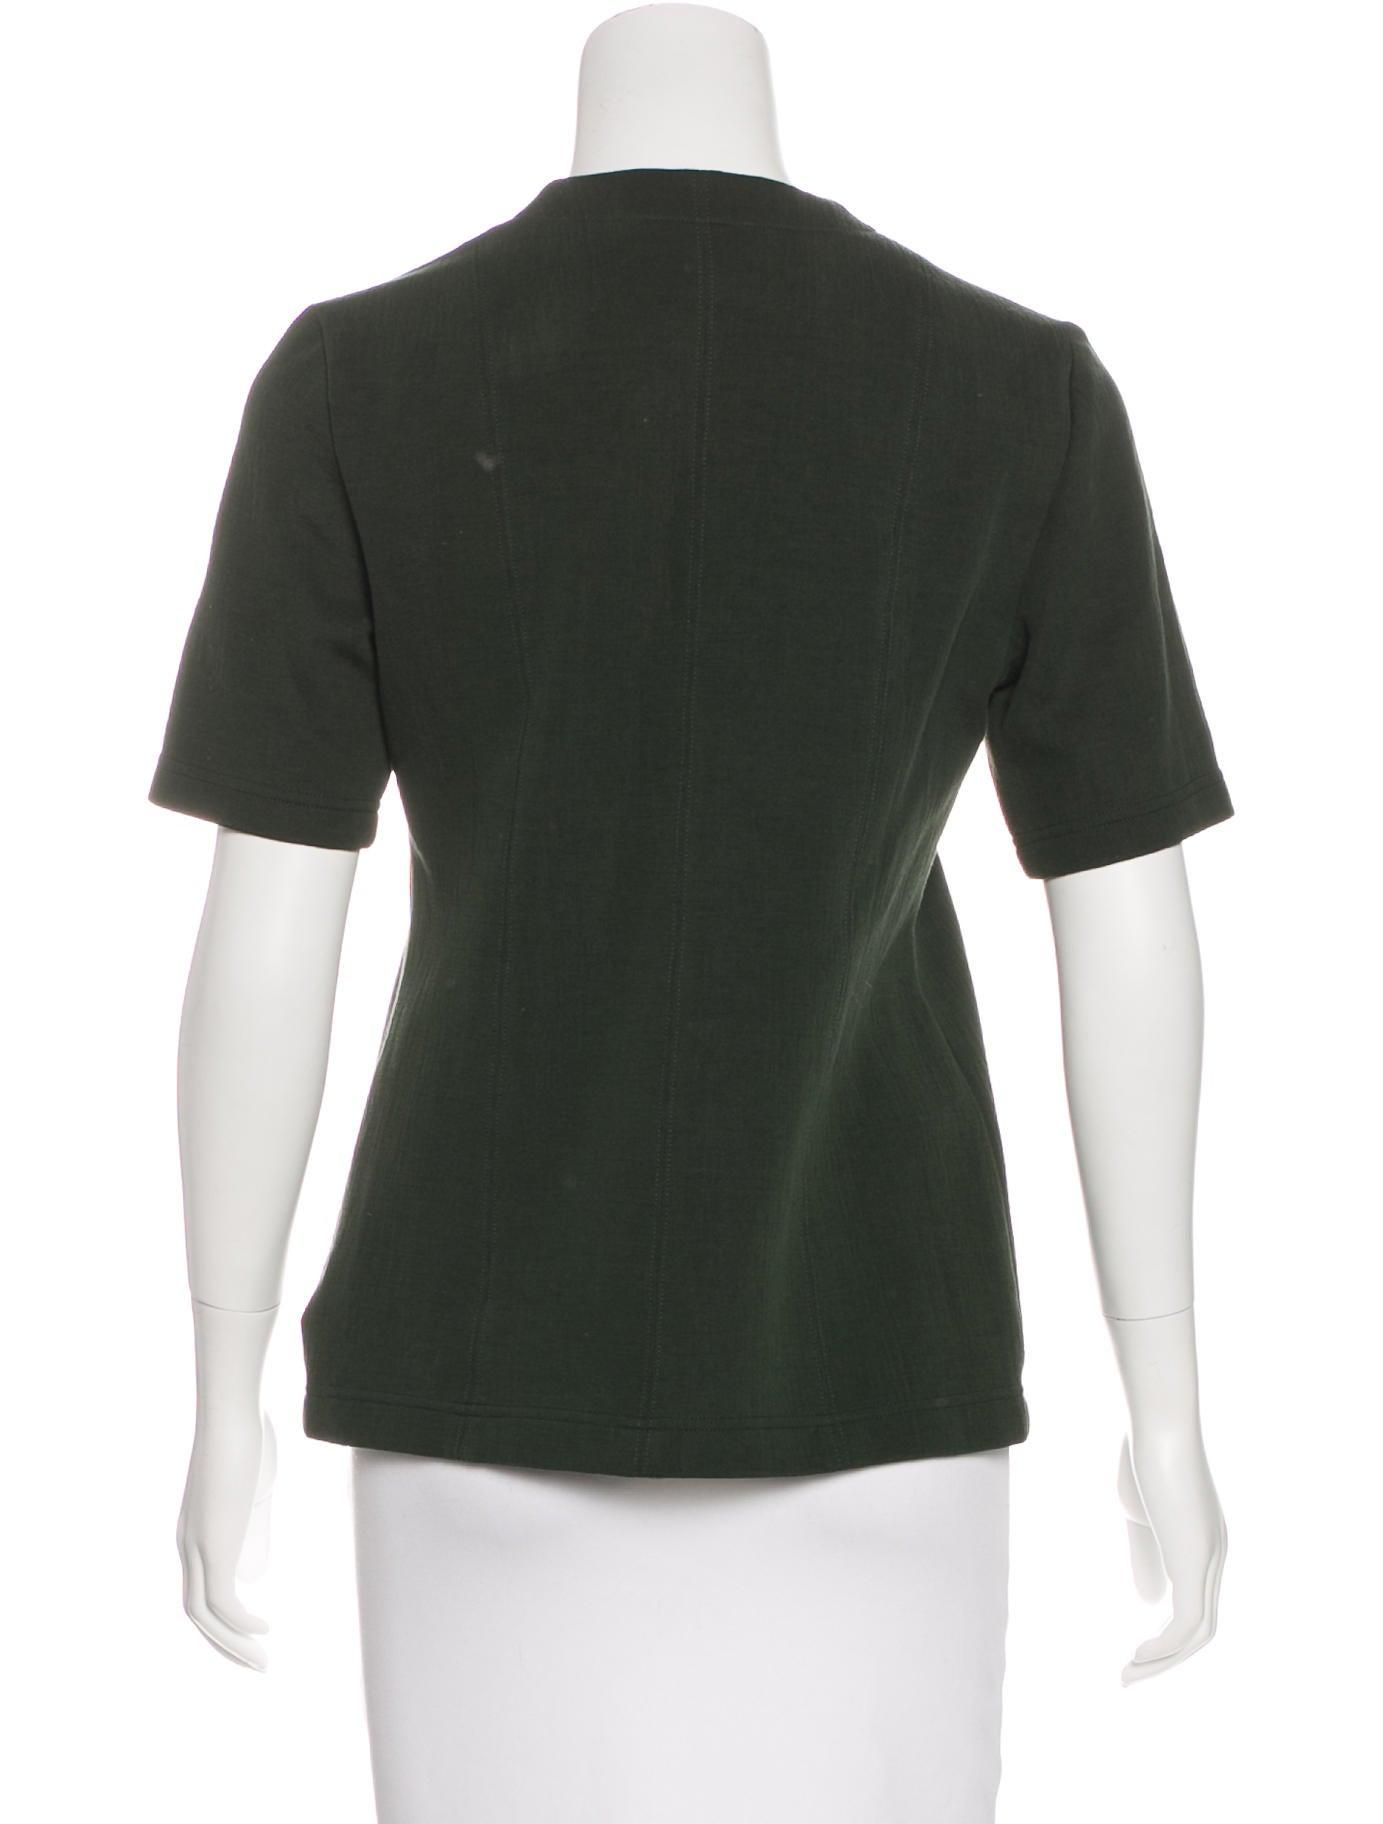 Victoria Beckham Jeans Short Sleeve V Neck Top Clothing